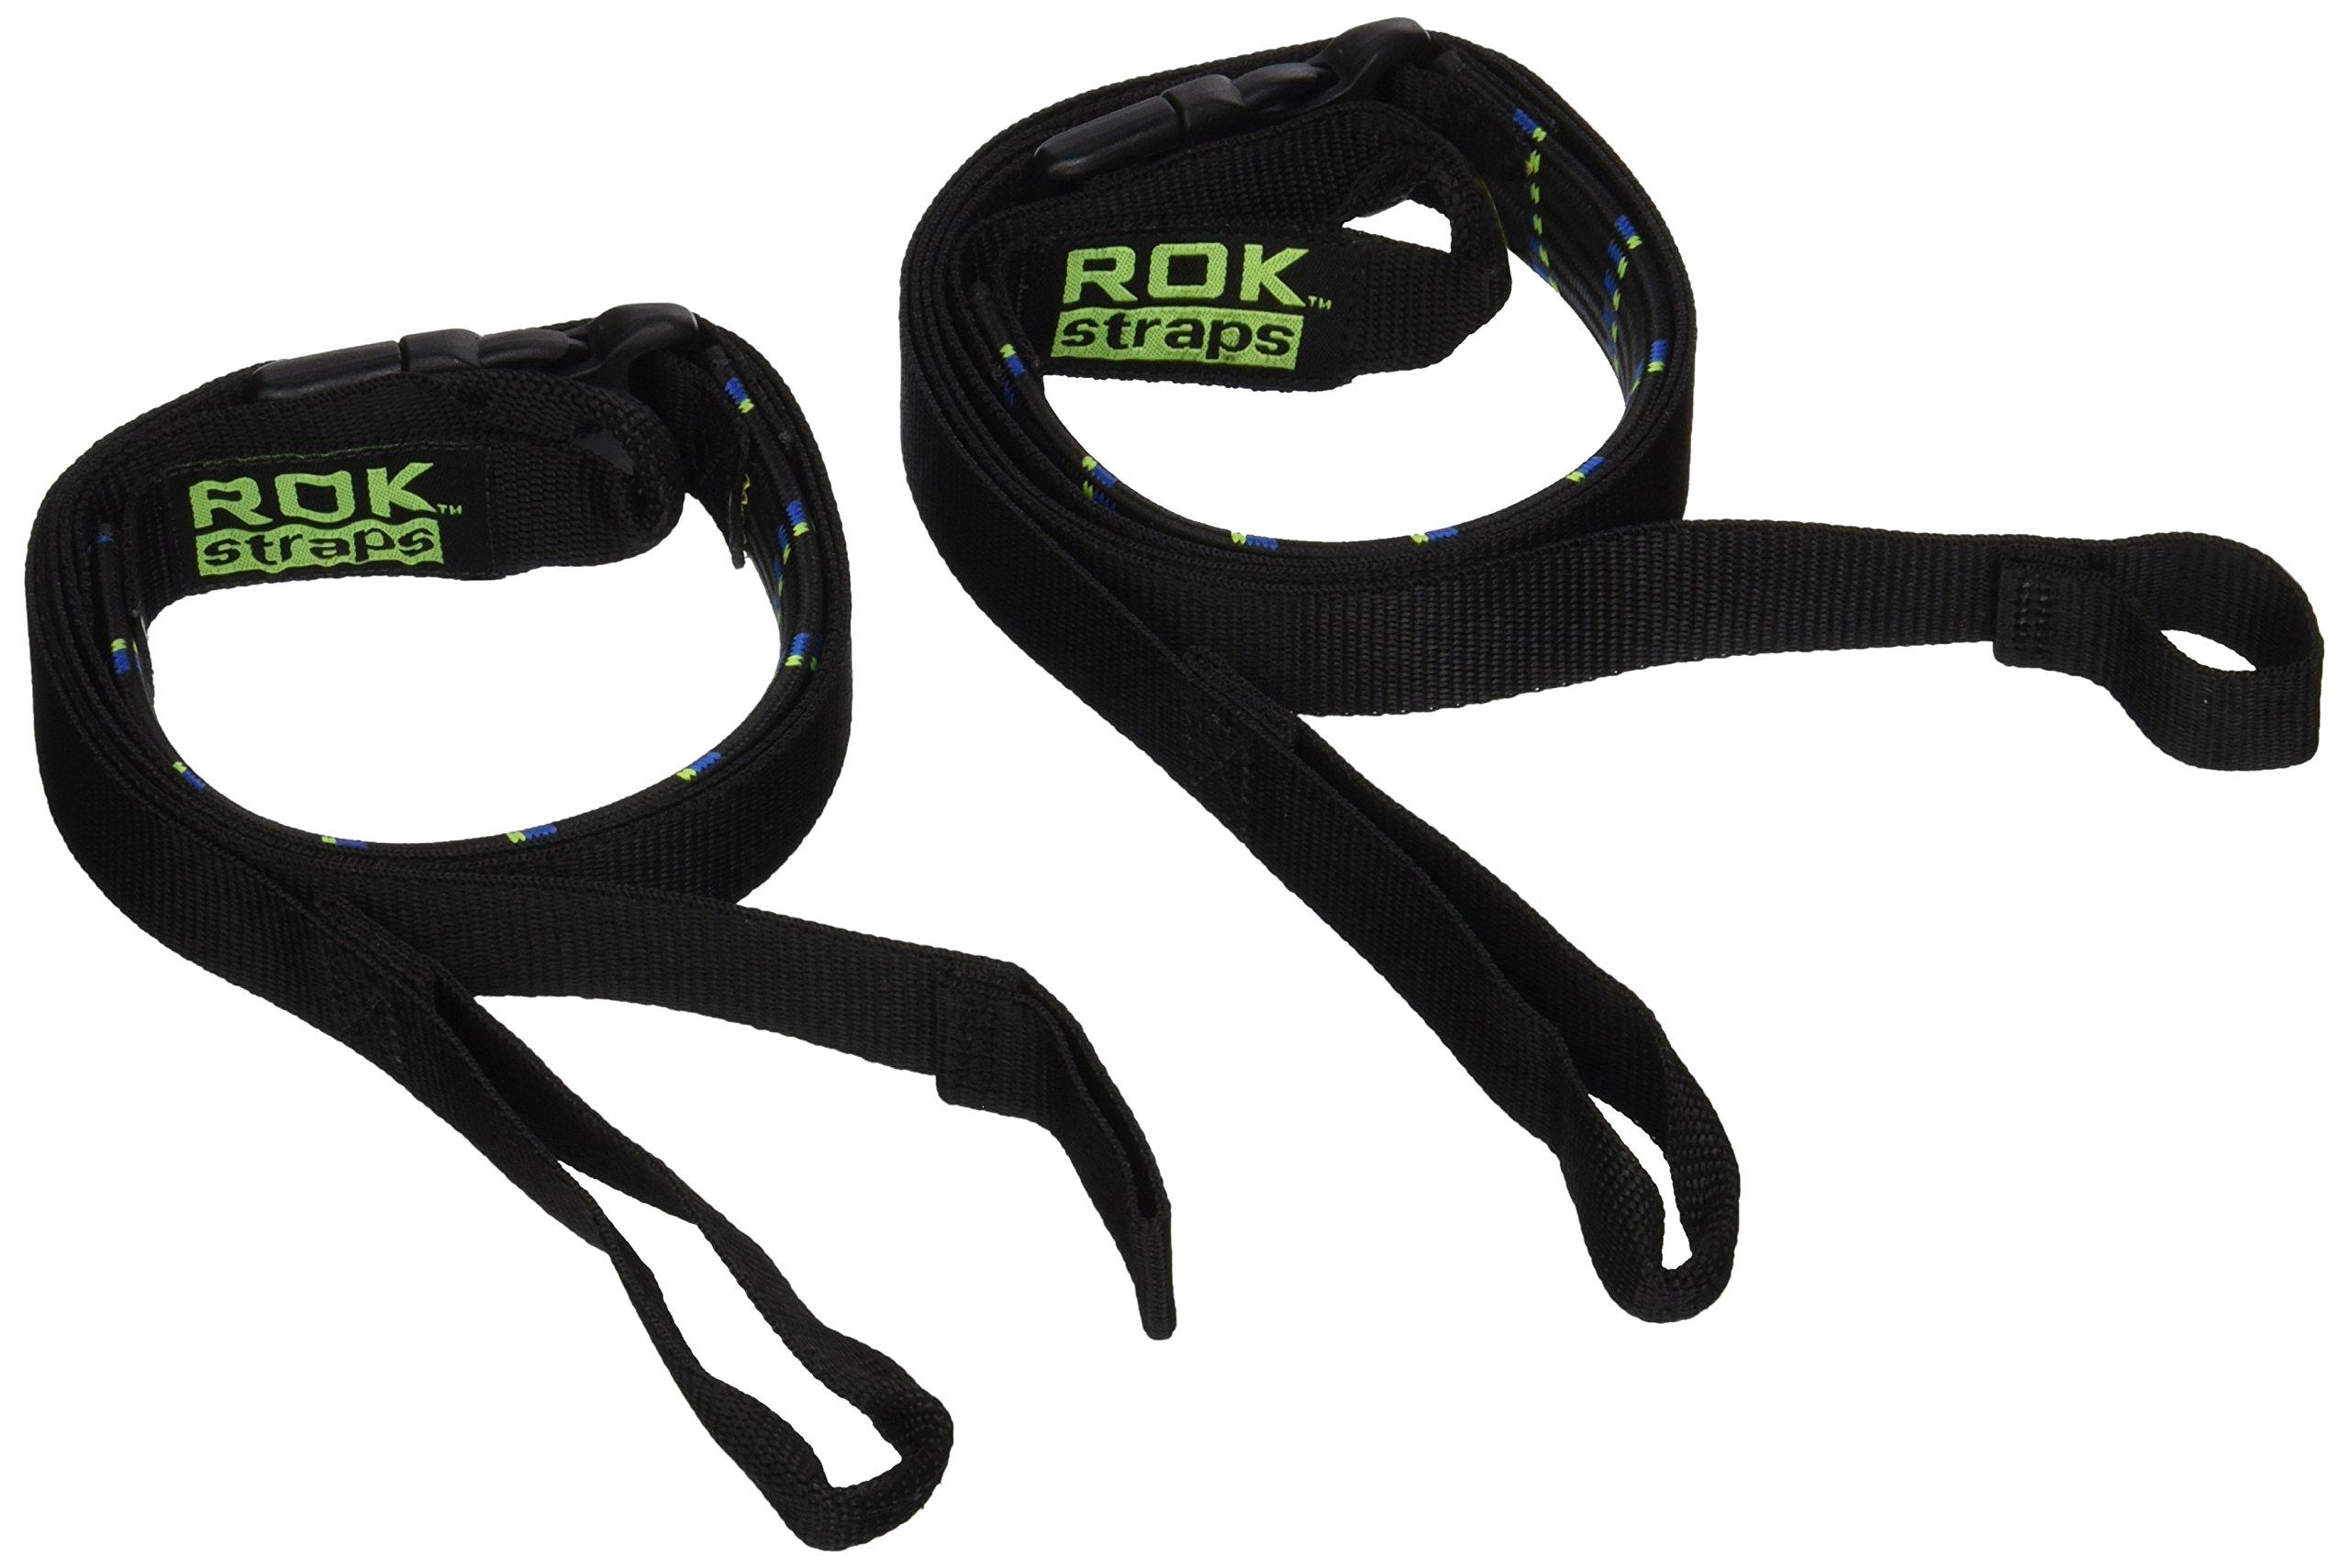 ROK Straps ROK-10001 Moto Plaid Black/Blue/Green 18''-60'' Motorcycle/ATV Adjustable Stretch Strap